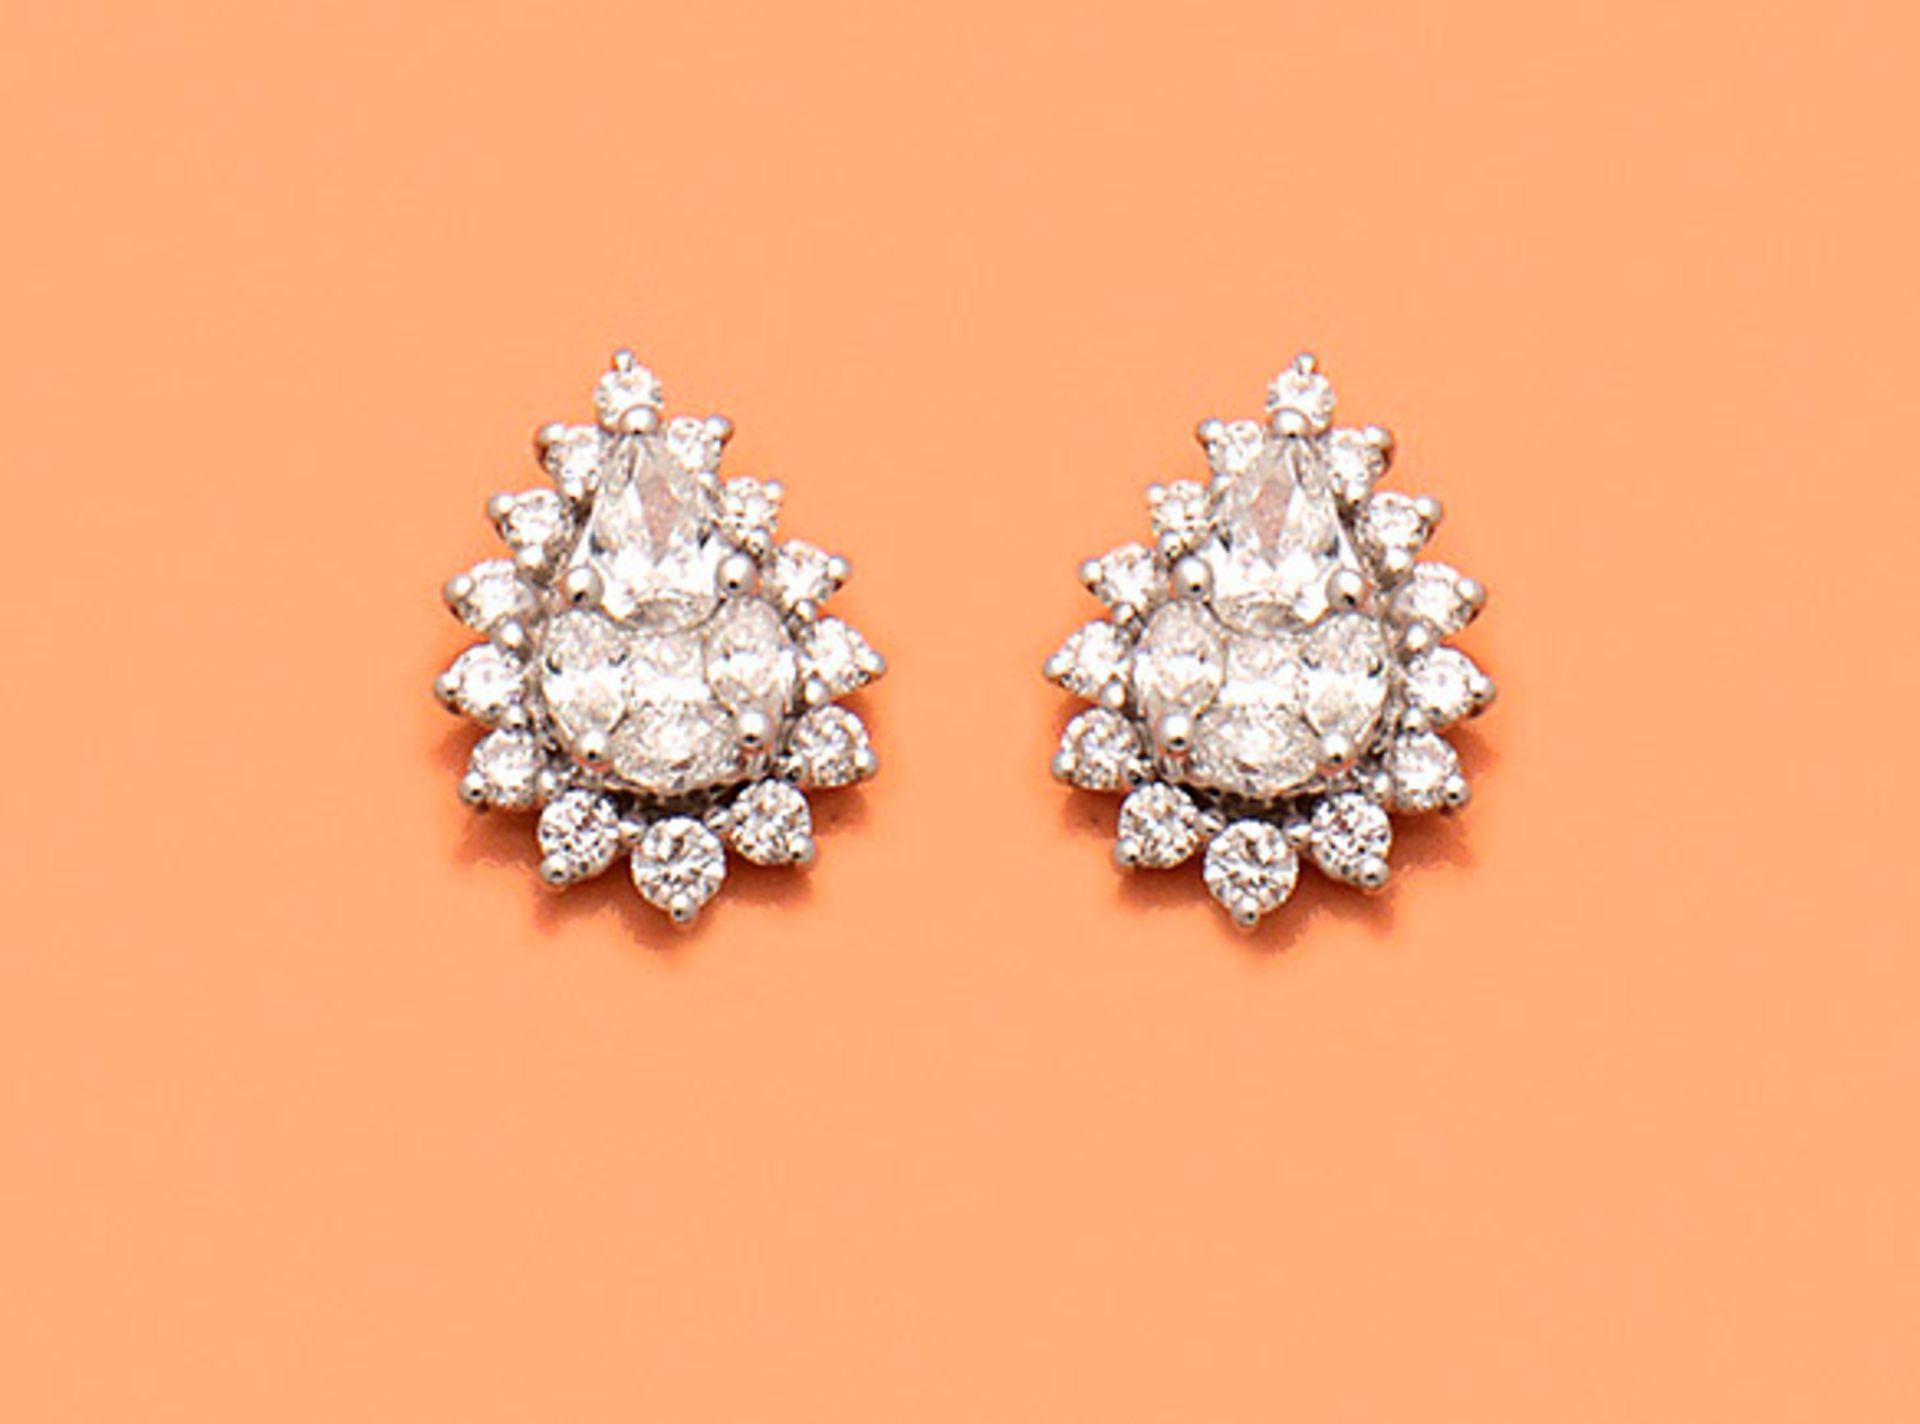 Paar hochfeine Diamant-Ohrringe